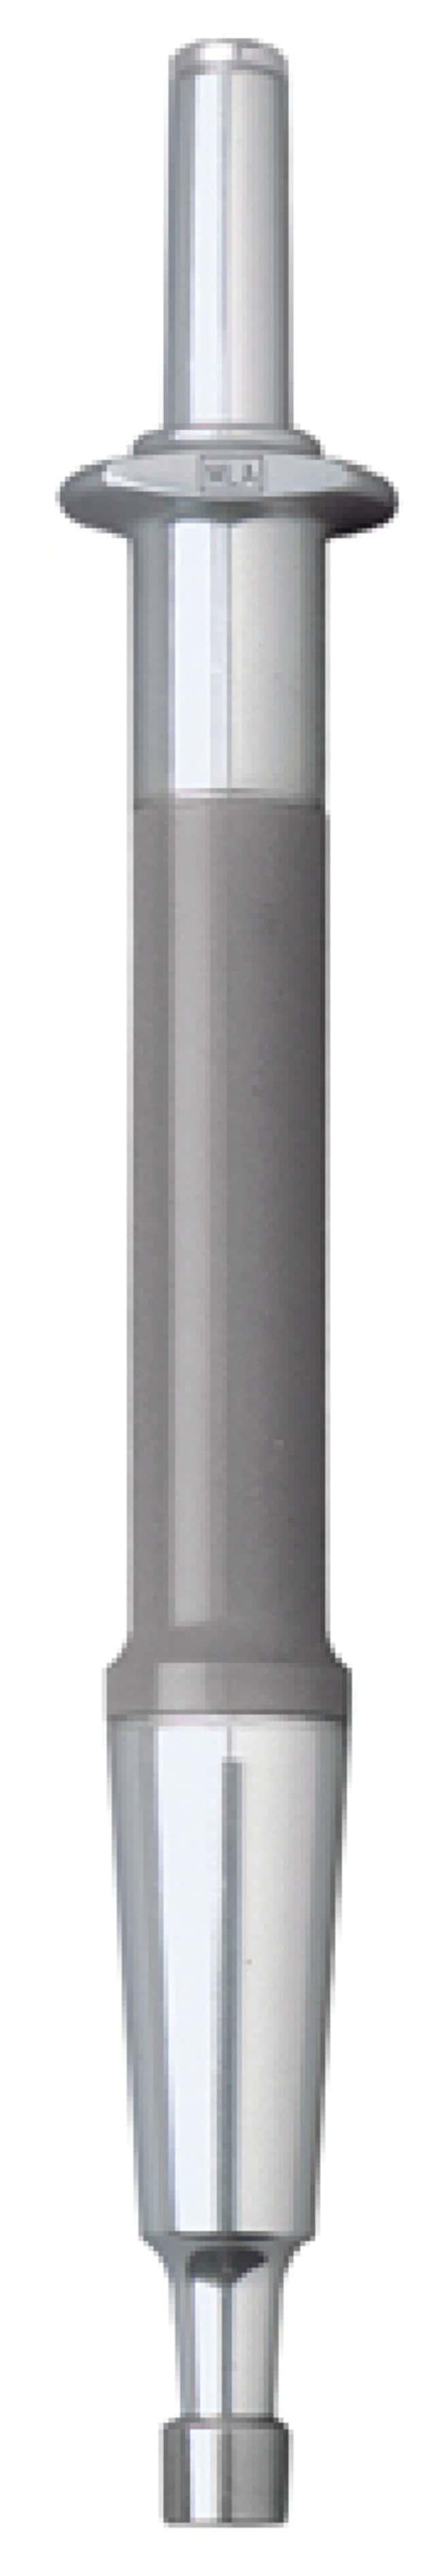 VistaLab™ TechnologiesMLA™ Brand Macro Pipetters Volume: 1mL; Barrel color: Gray VistaLab™ TechnologiesMLA™ Brand Macro Pipetters